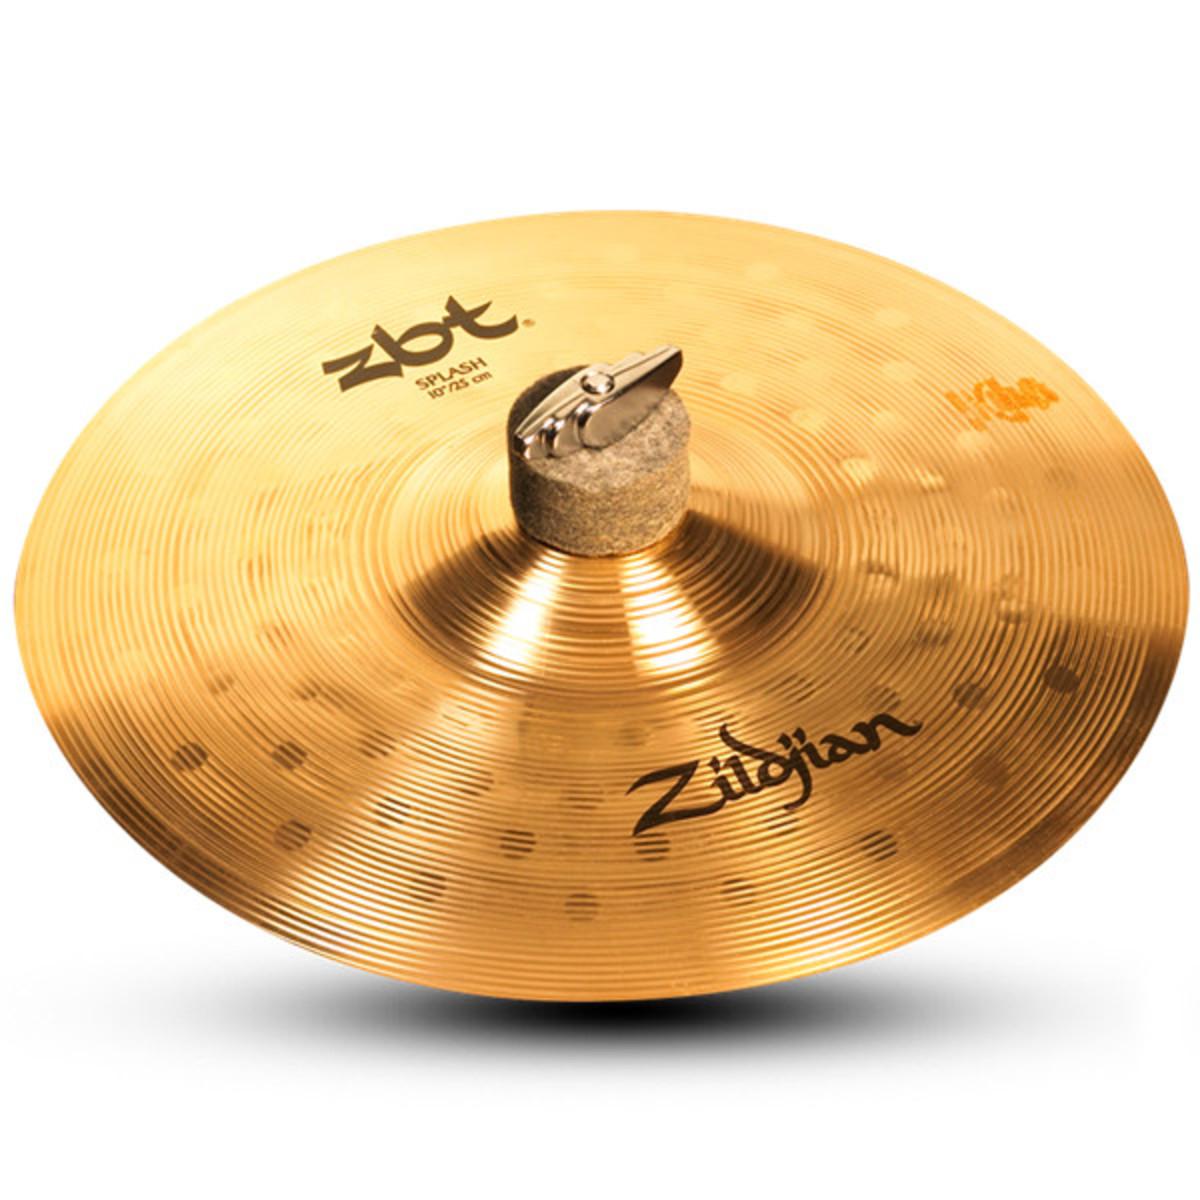 zildjian zbt 10 splash cymbal at gear4music. Black Bedroom Furniture Sets. Home Design Ideas